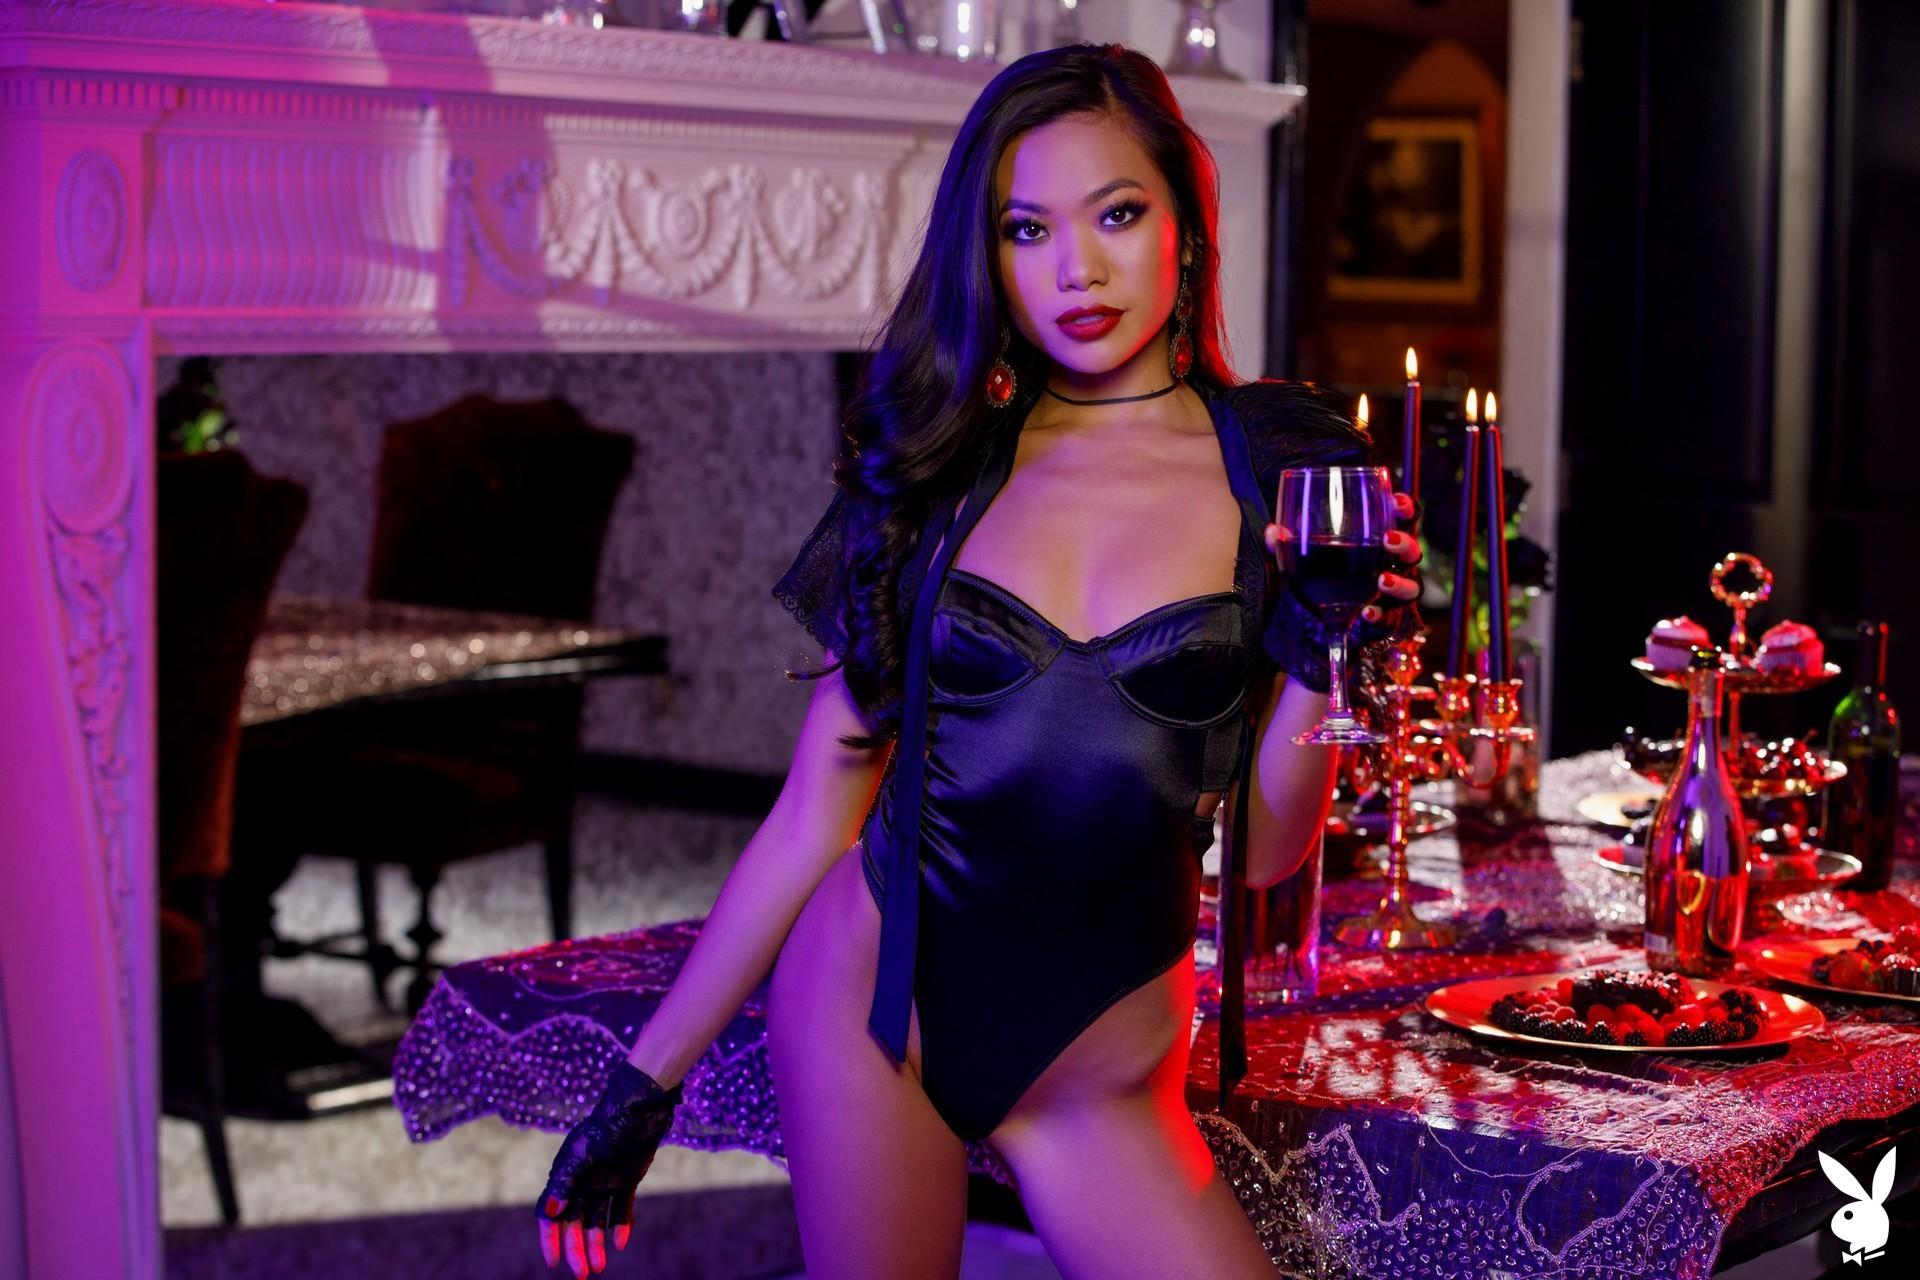 Vina Sky In Midnight Indulgence Playboy Plus (3)